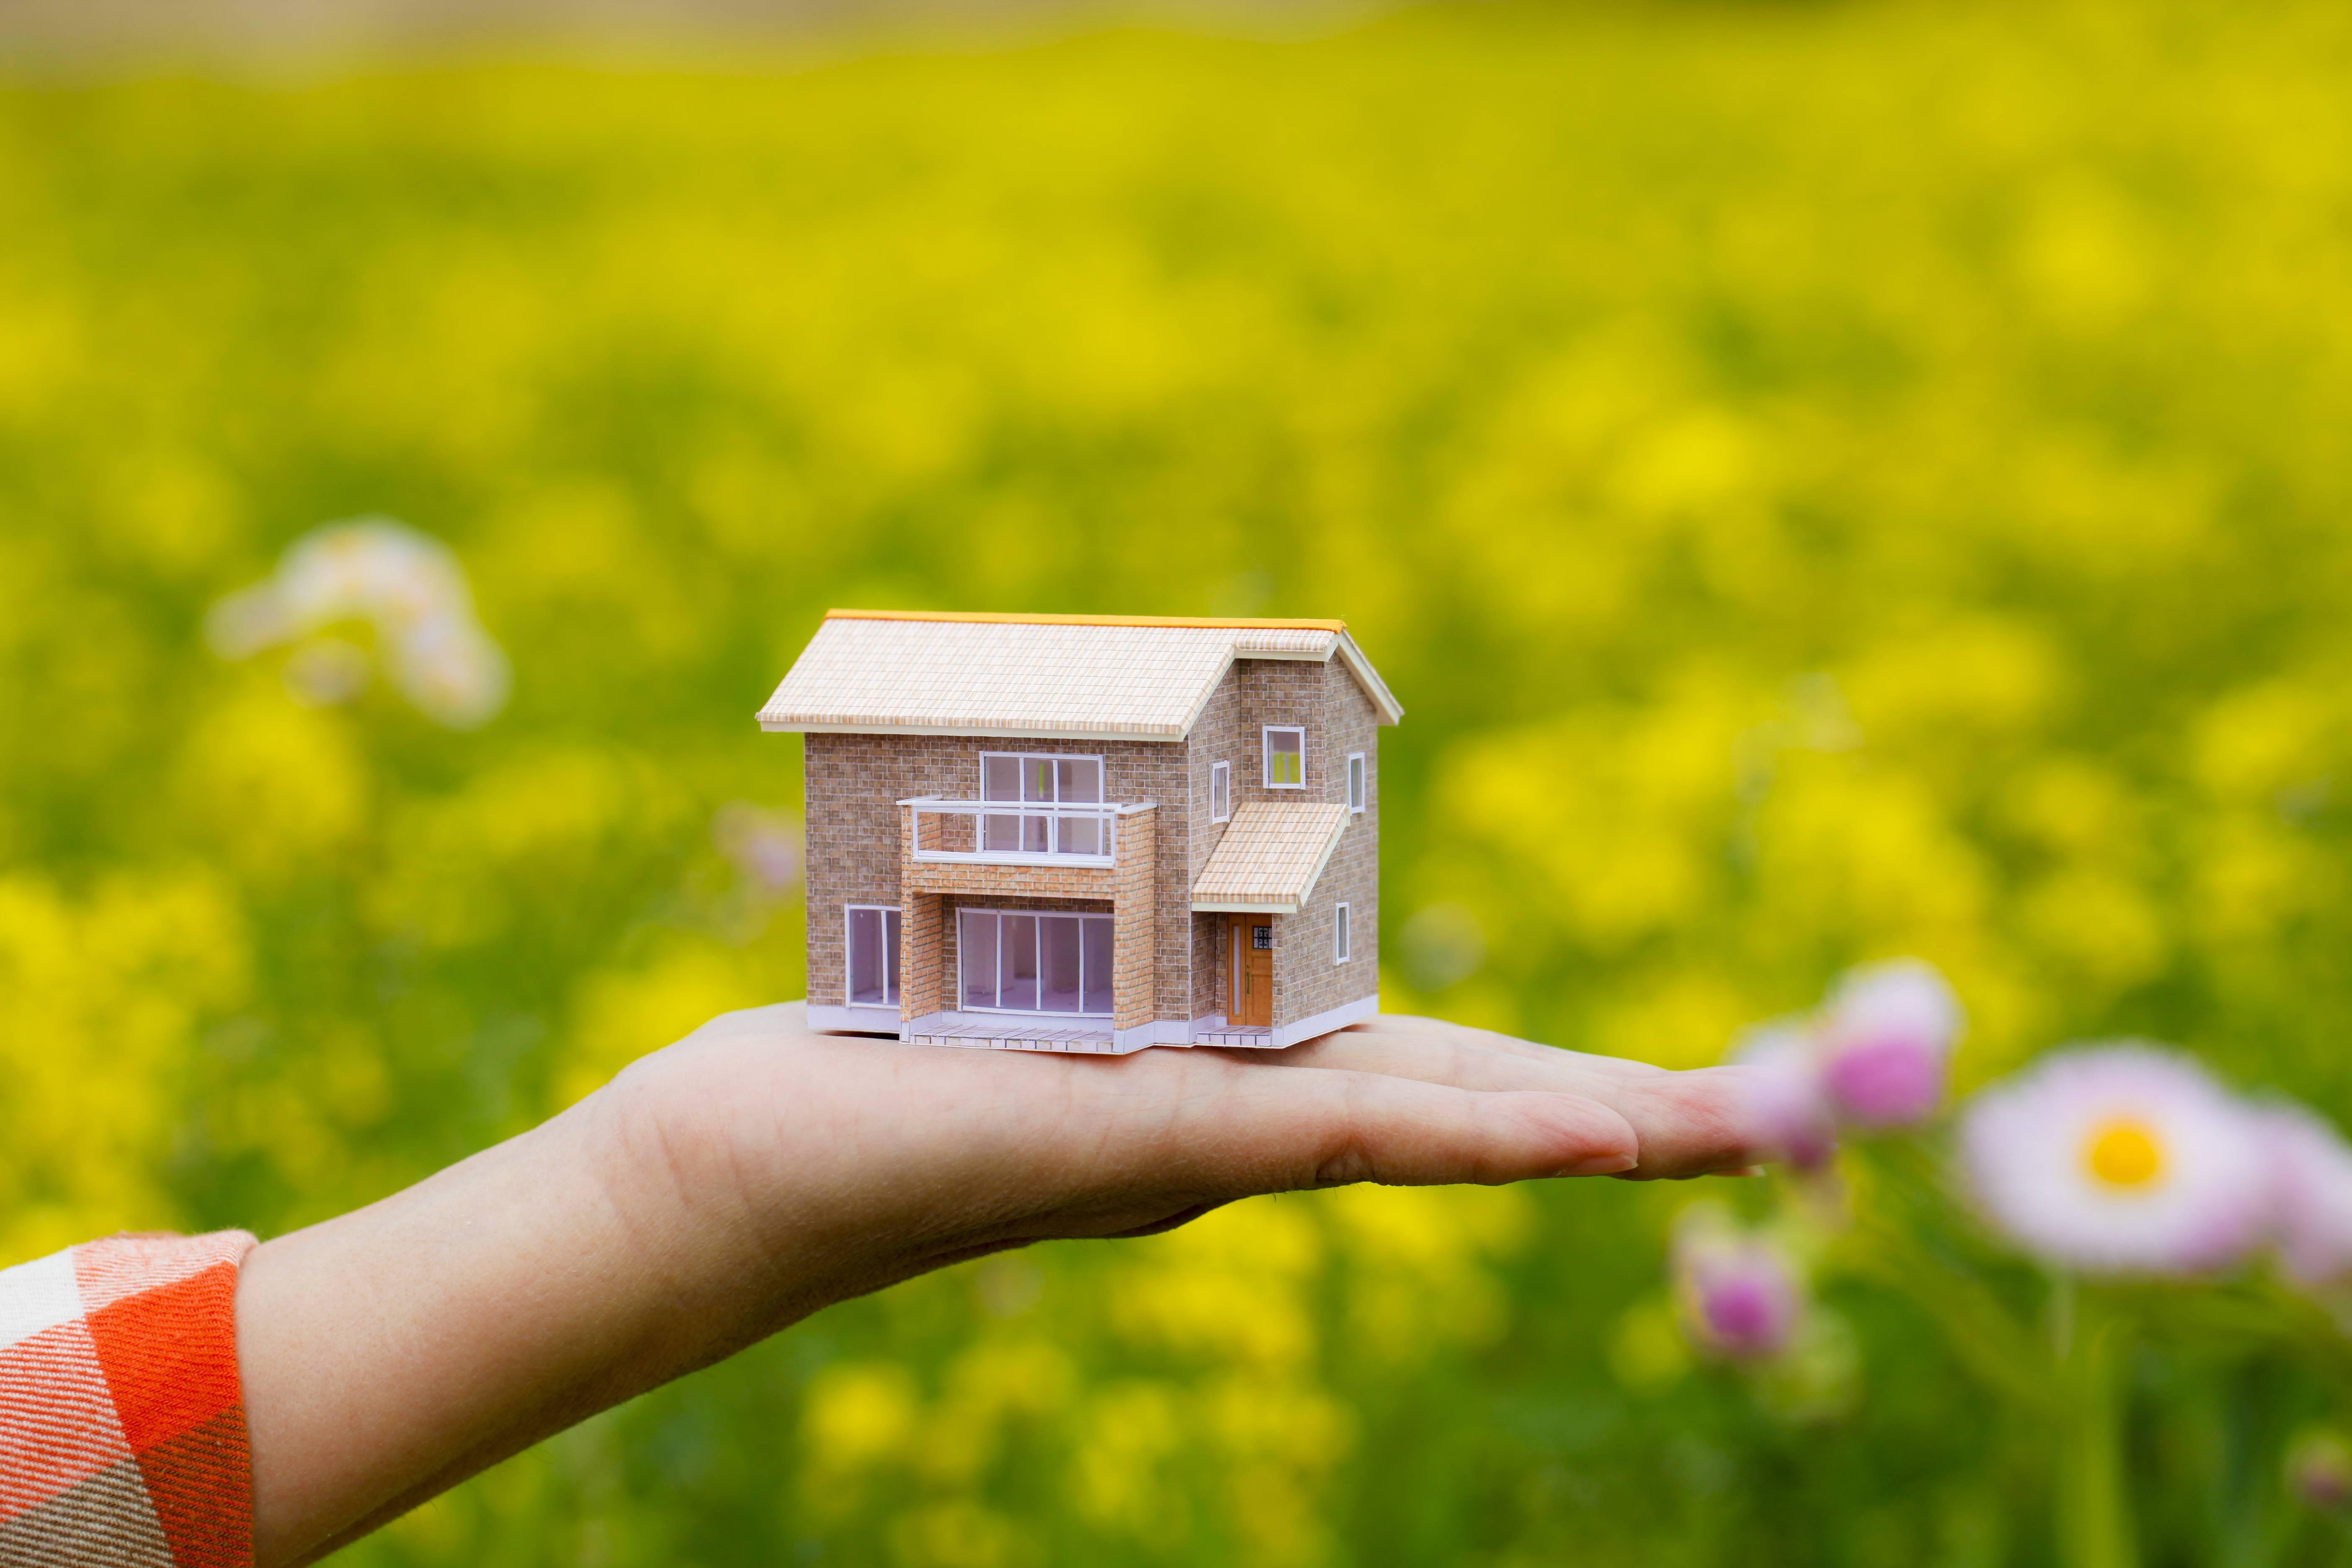 model-home-woman-hand-field-eco-living-smartexpat